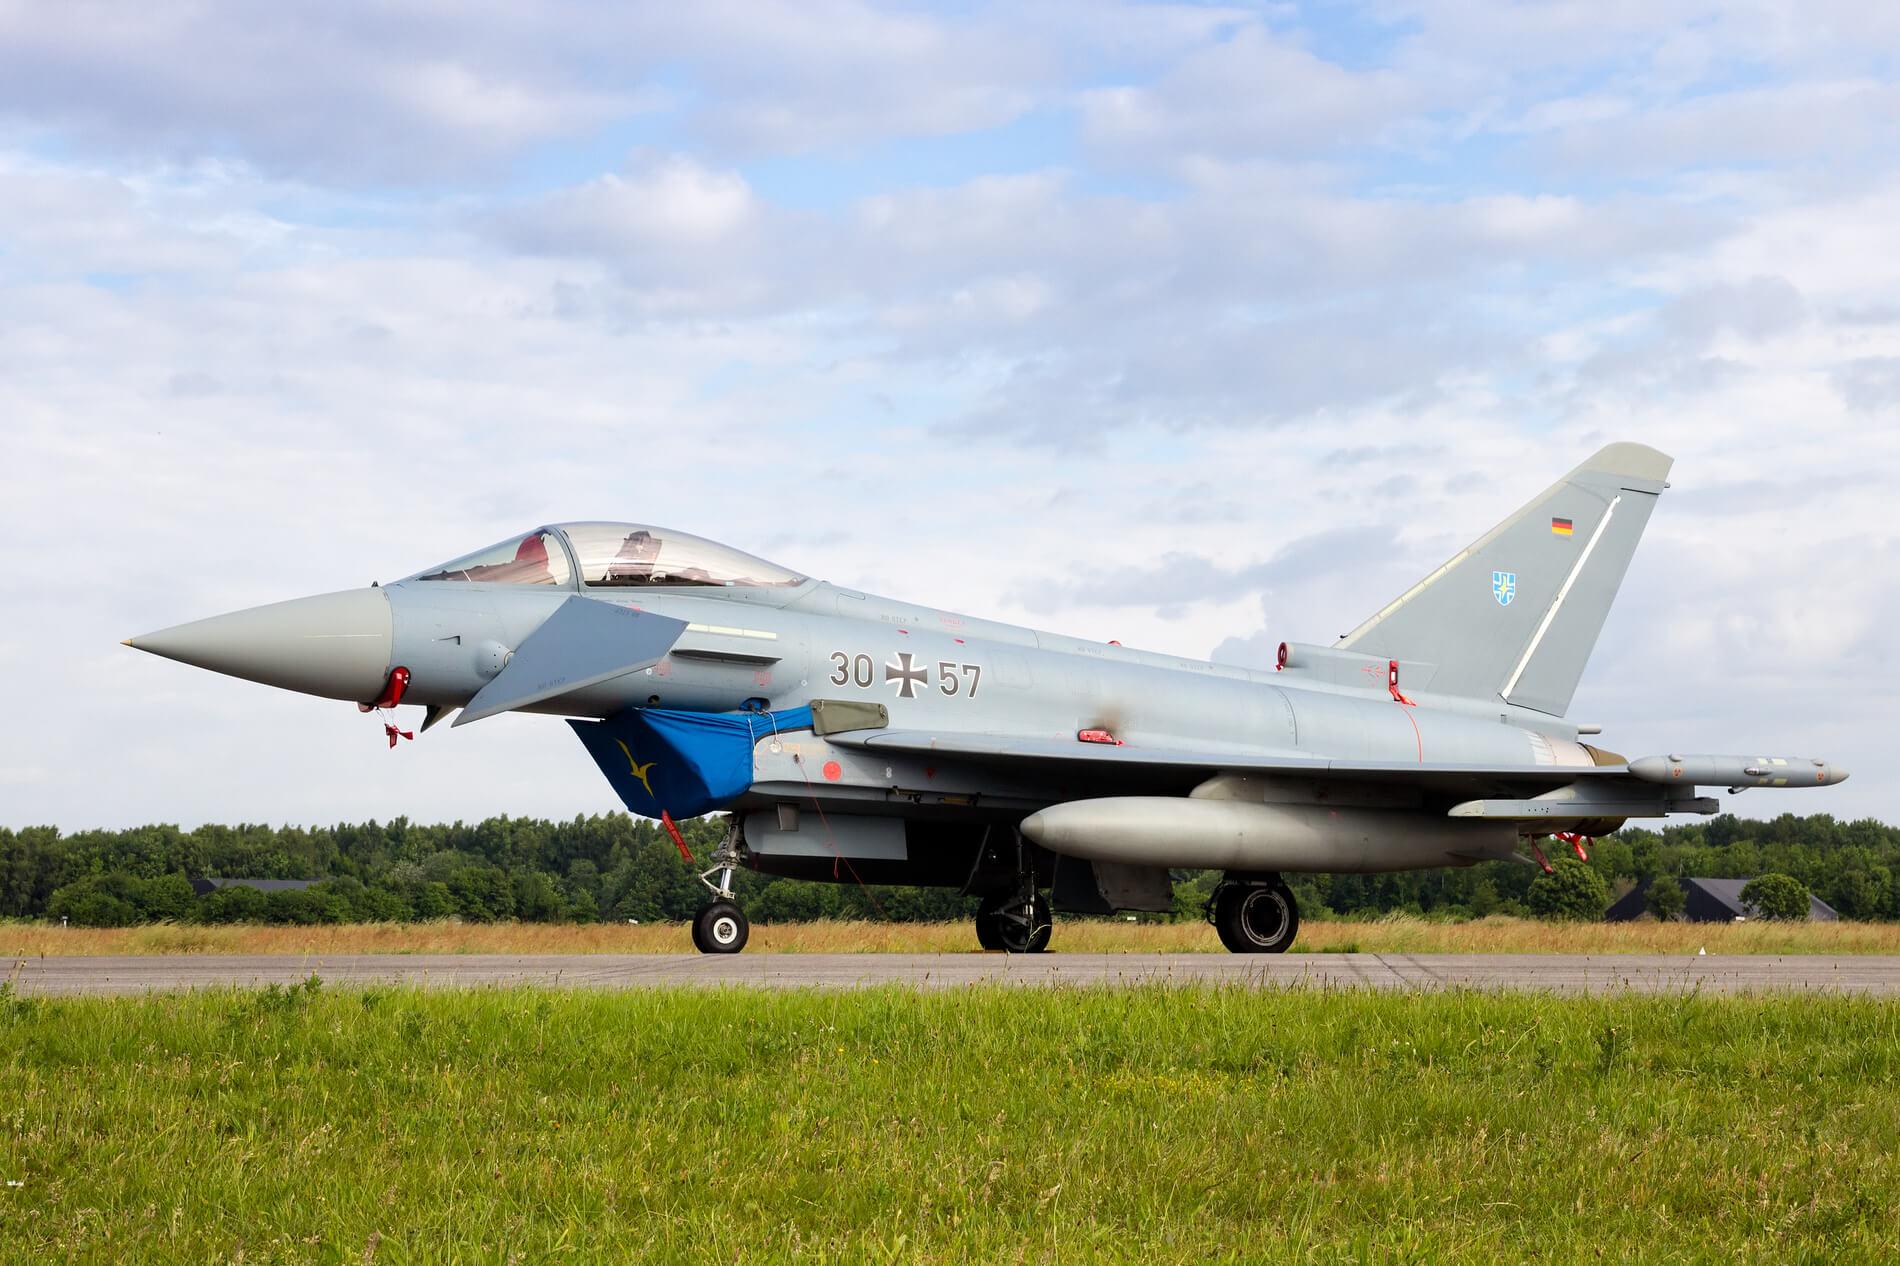 a german eurofighter typhoon - قرارداد خرید 38 یوروفایتر بین ایرباس و نیروی هوایی آلمان امضاء شد